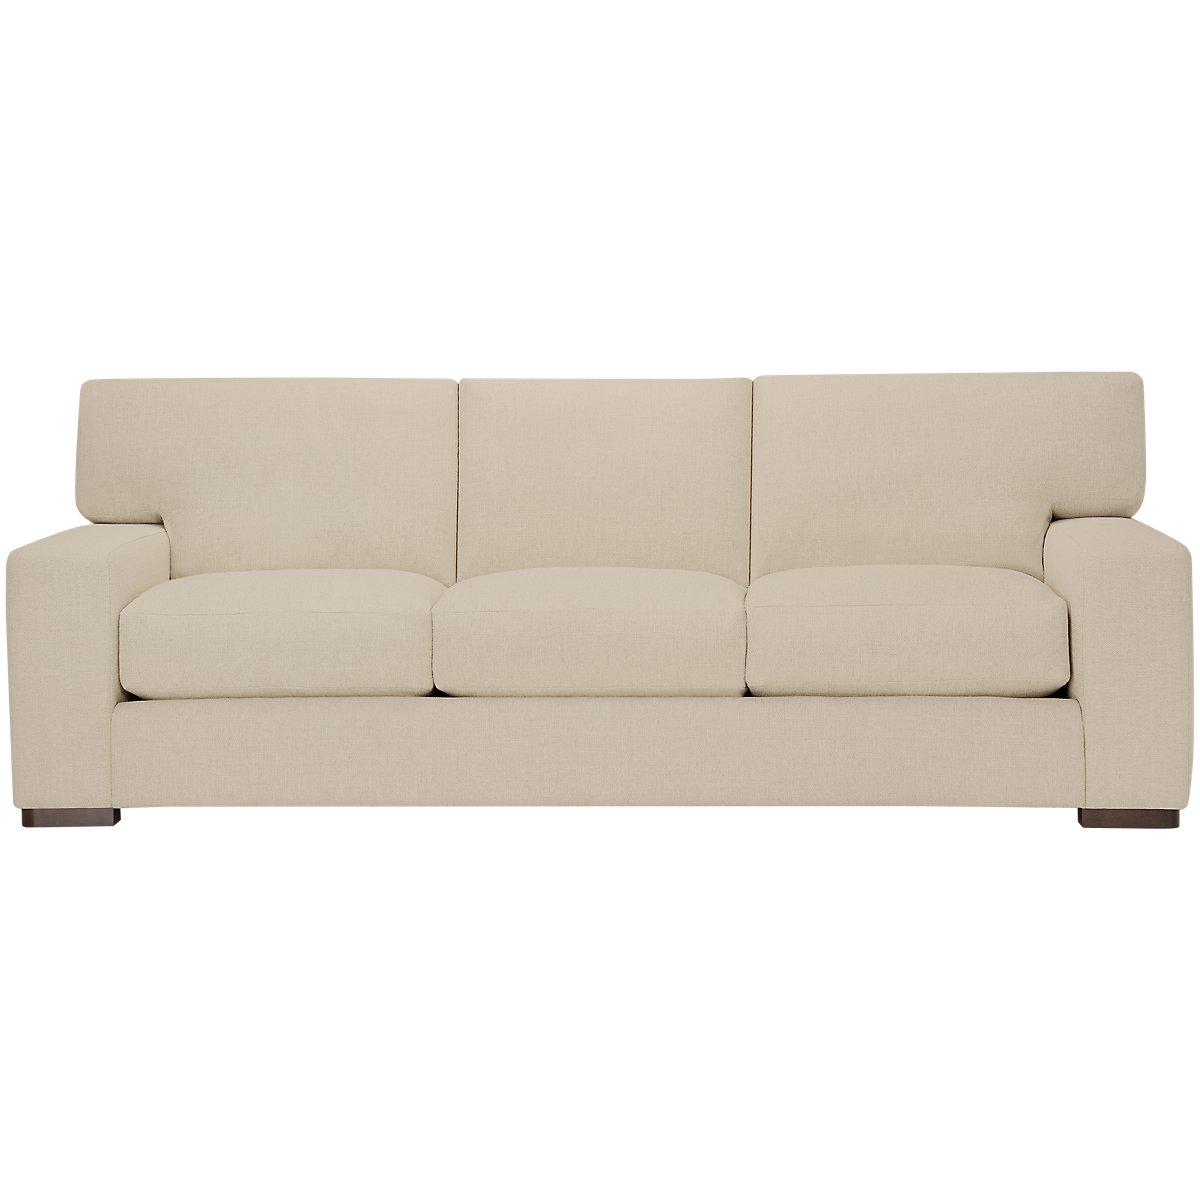 Veronica Khaki Fabric Down Large Sofa